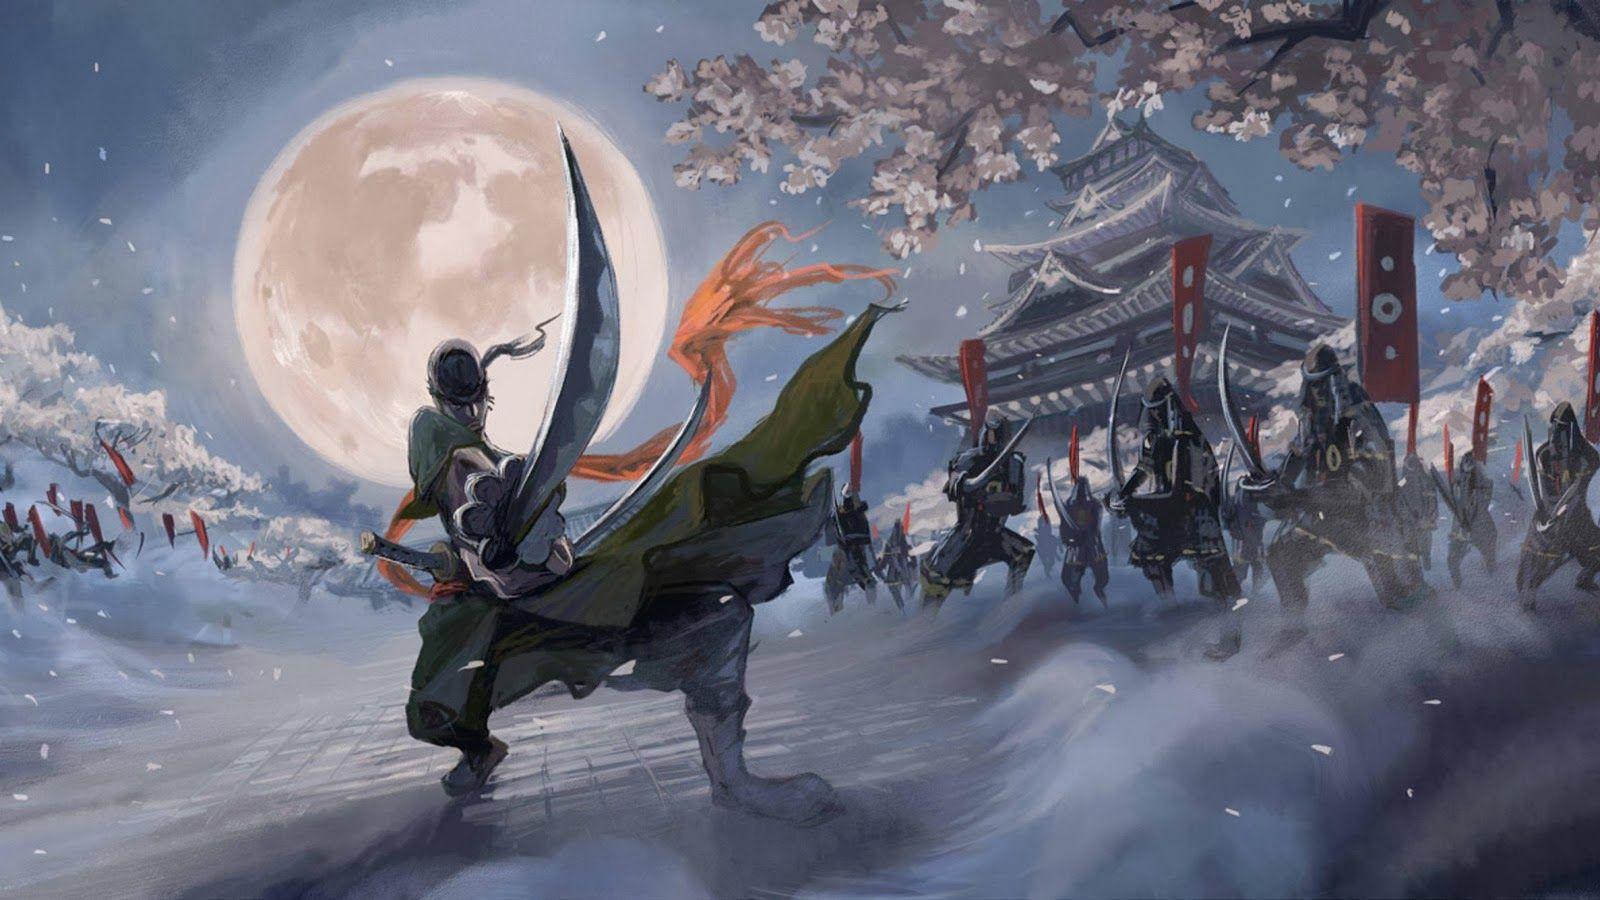 Imagen Relacionada Roronoa Zoro Gambar Awan Samurai